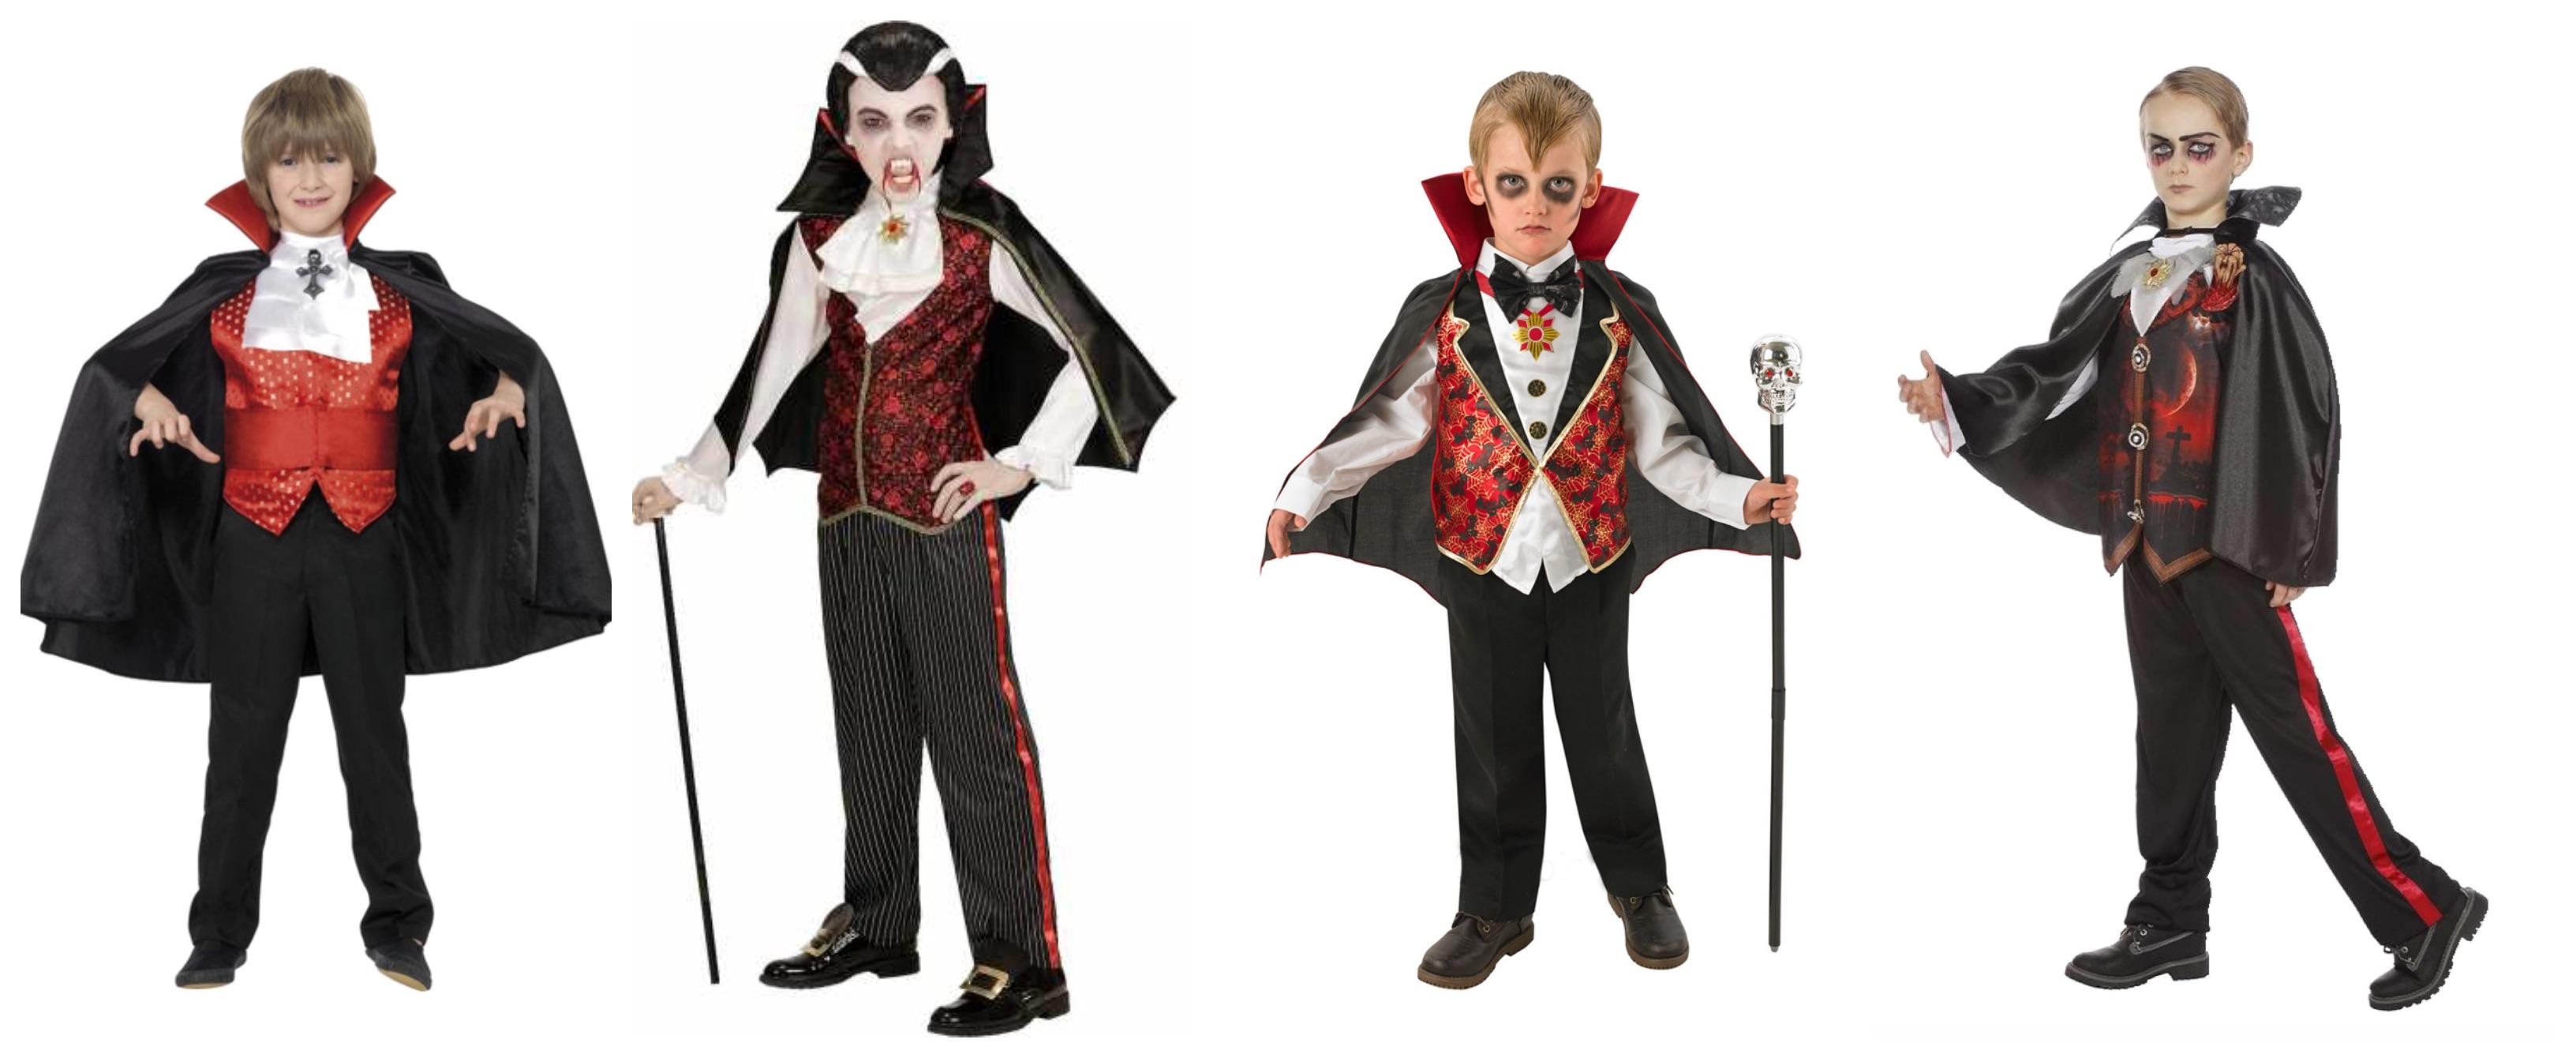 dracula kostume til børn - Dracula kostume til børn